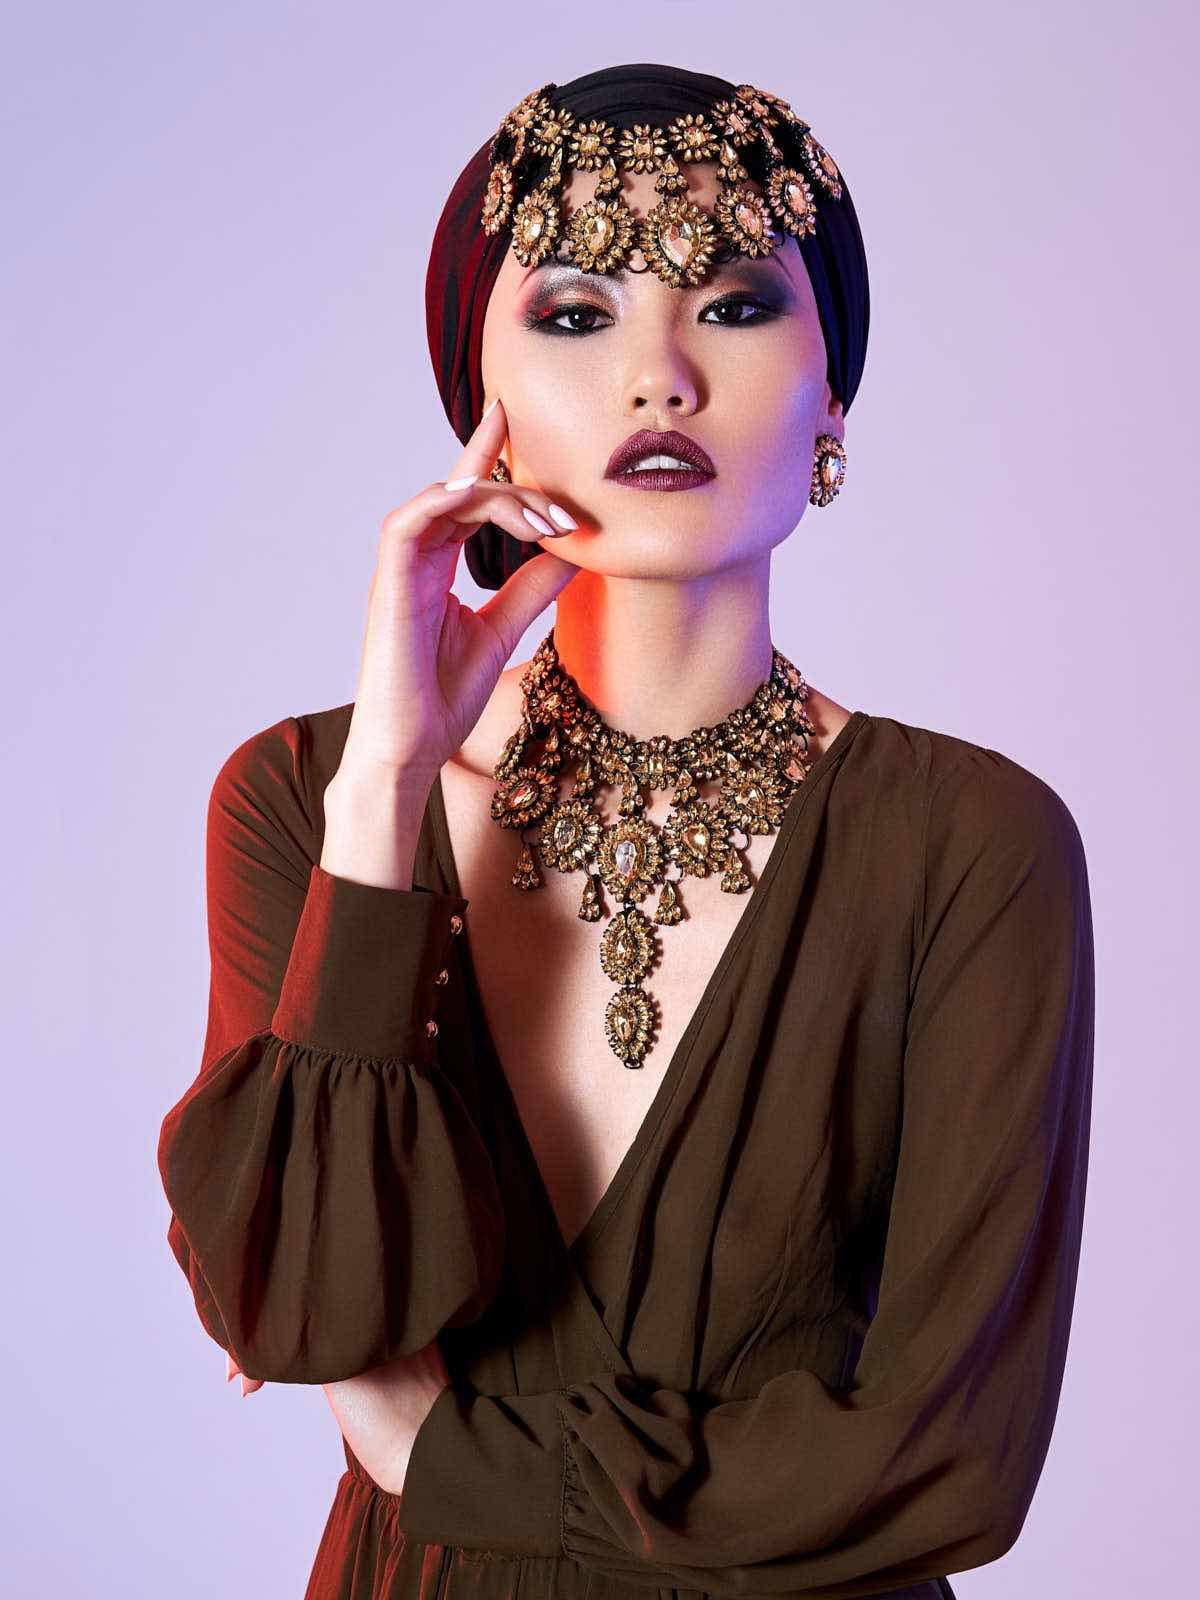 sce-agency-female-model-tia-b-7aaaa